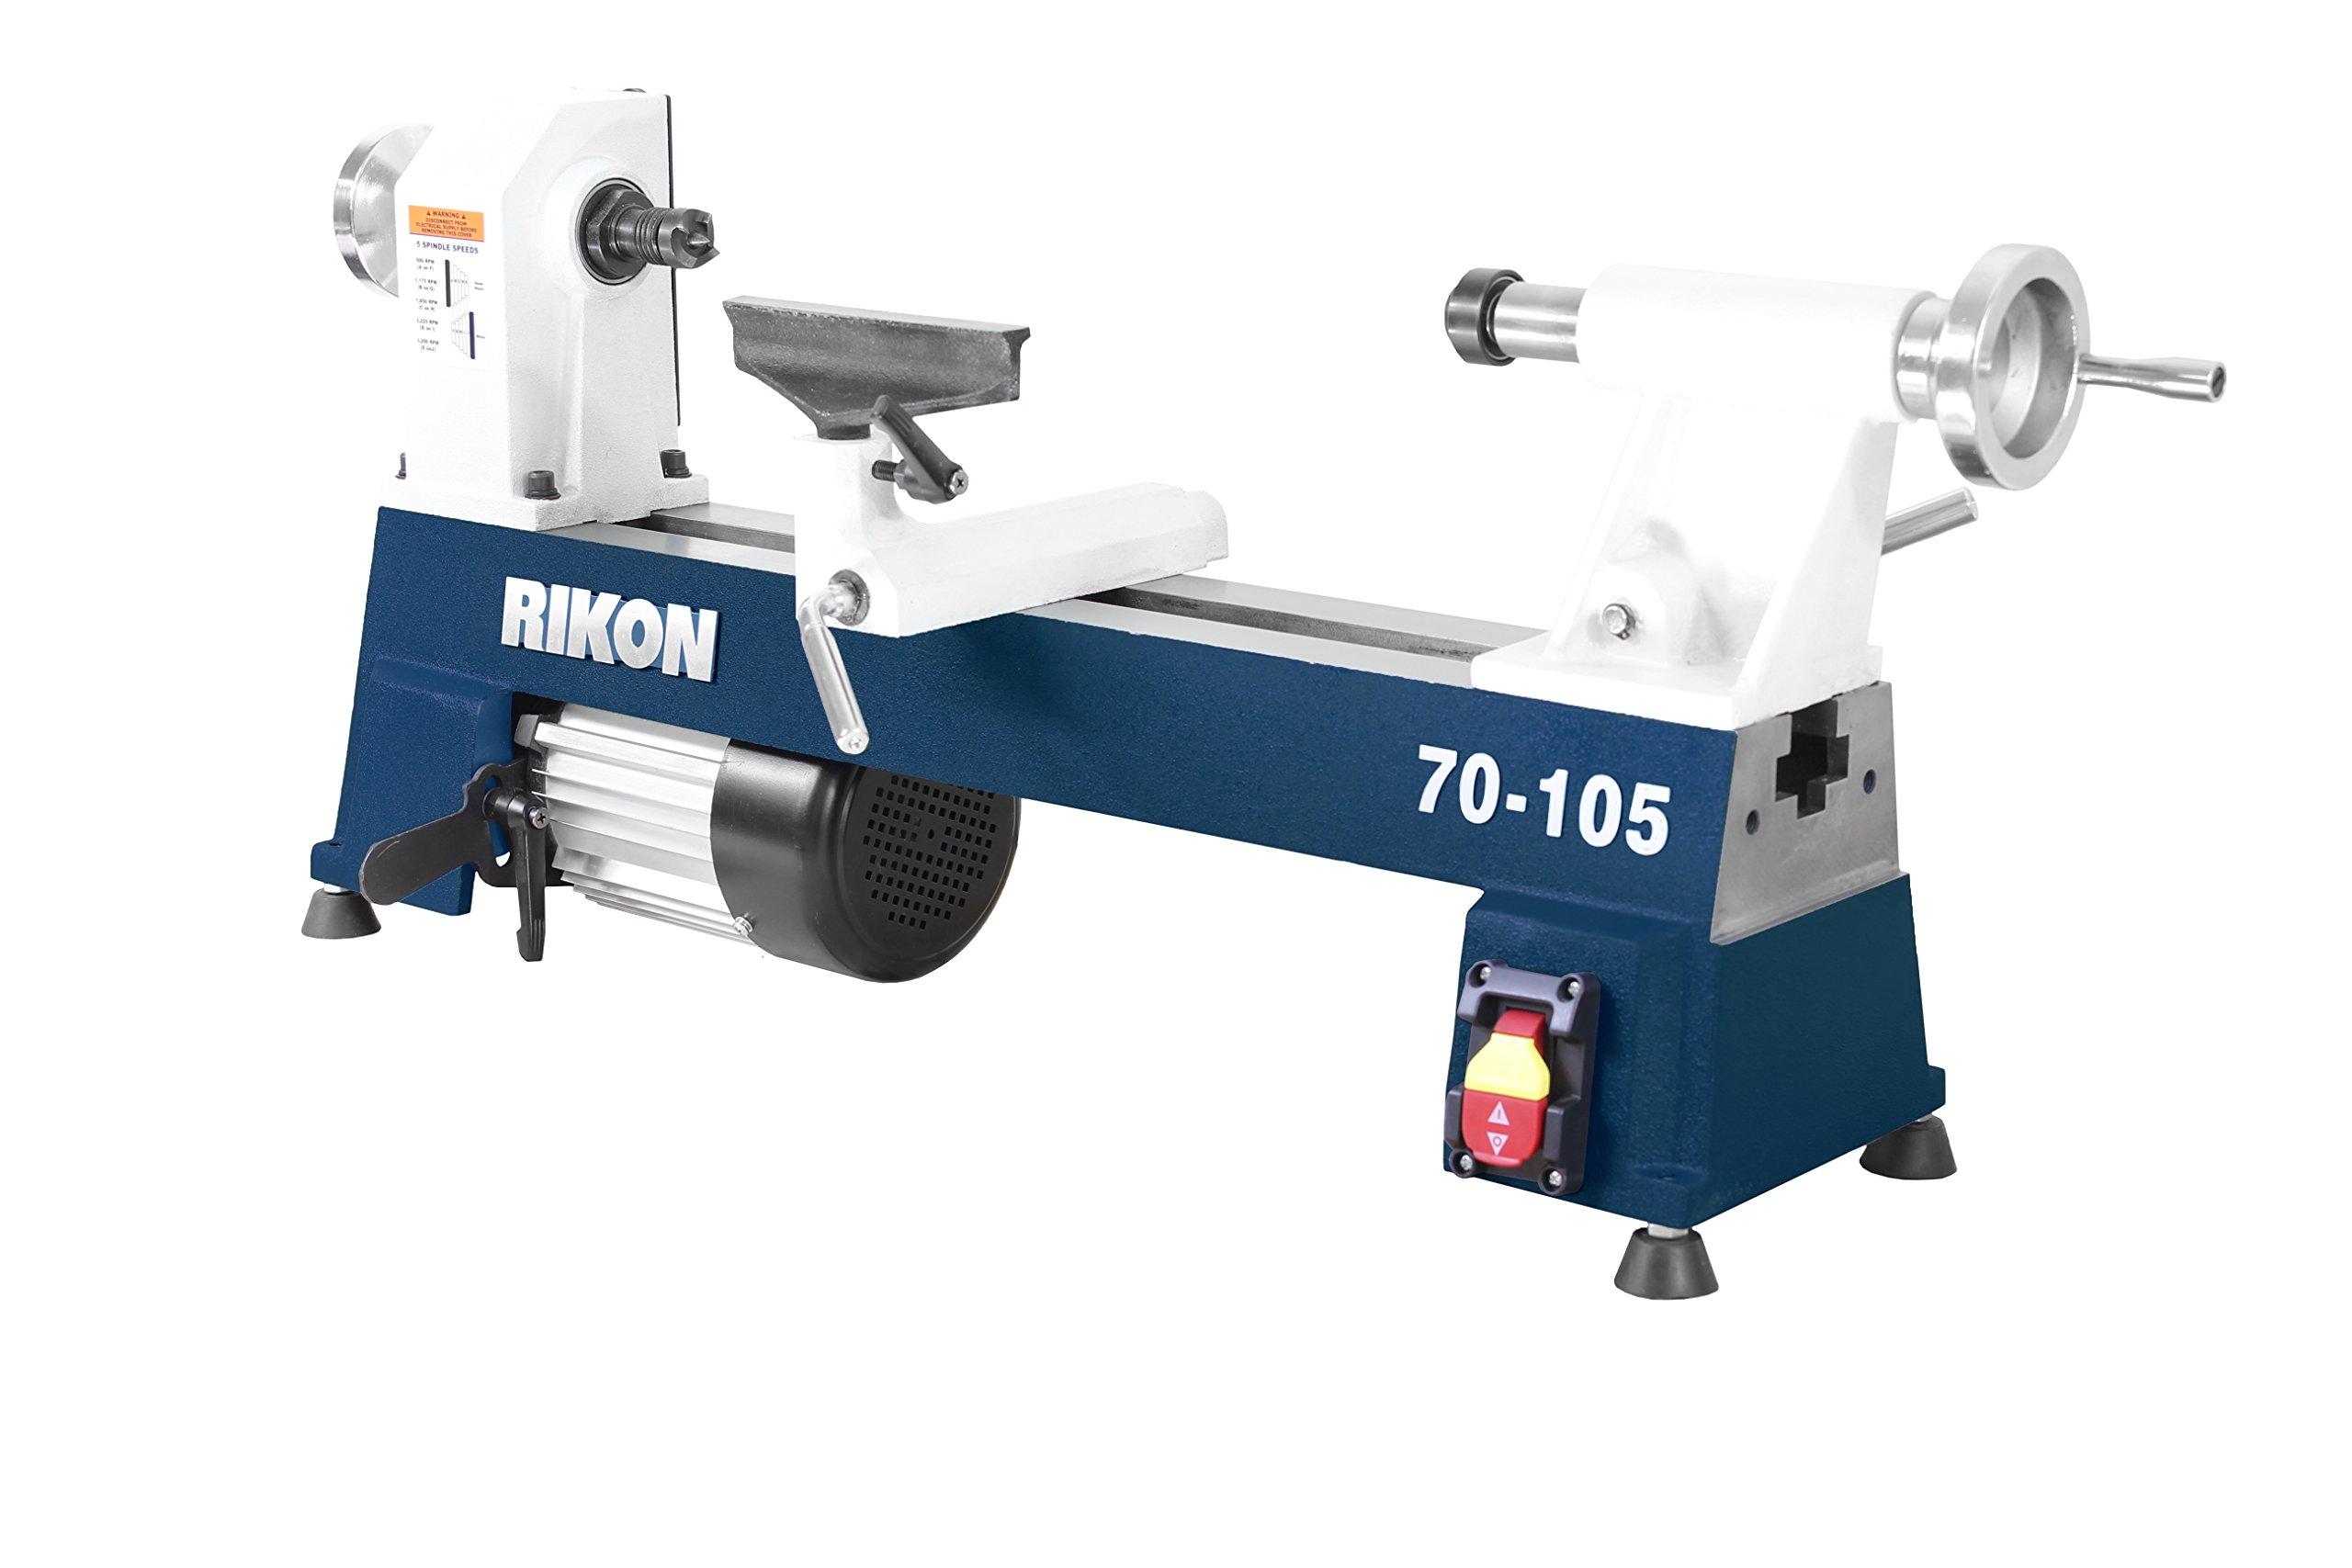 RIKON Power Tools 70-105 10'' x 18'' 1/2 hp Mini Lathe by RIKON Power Tools